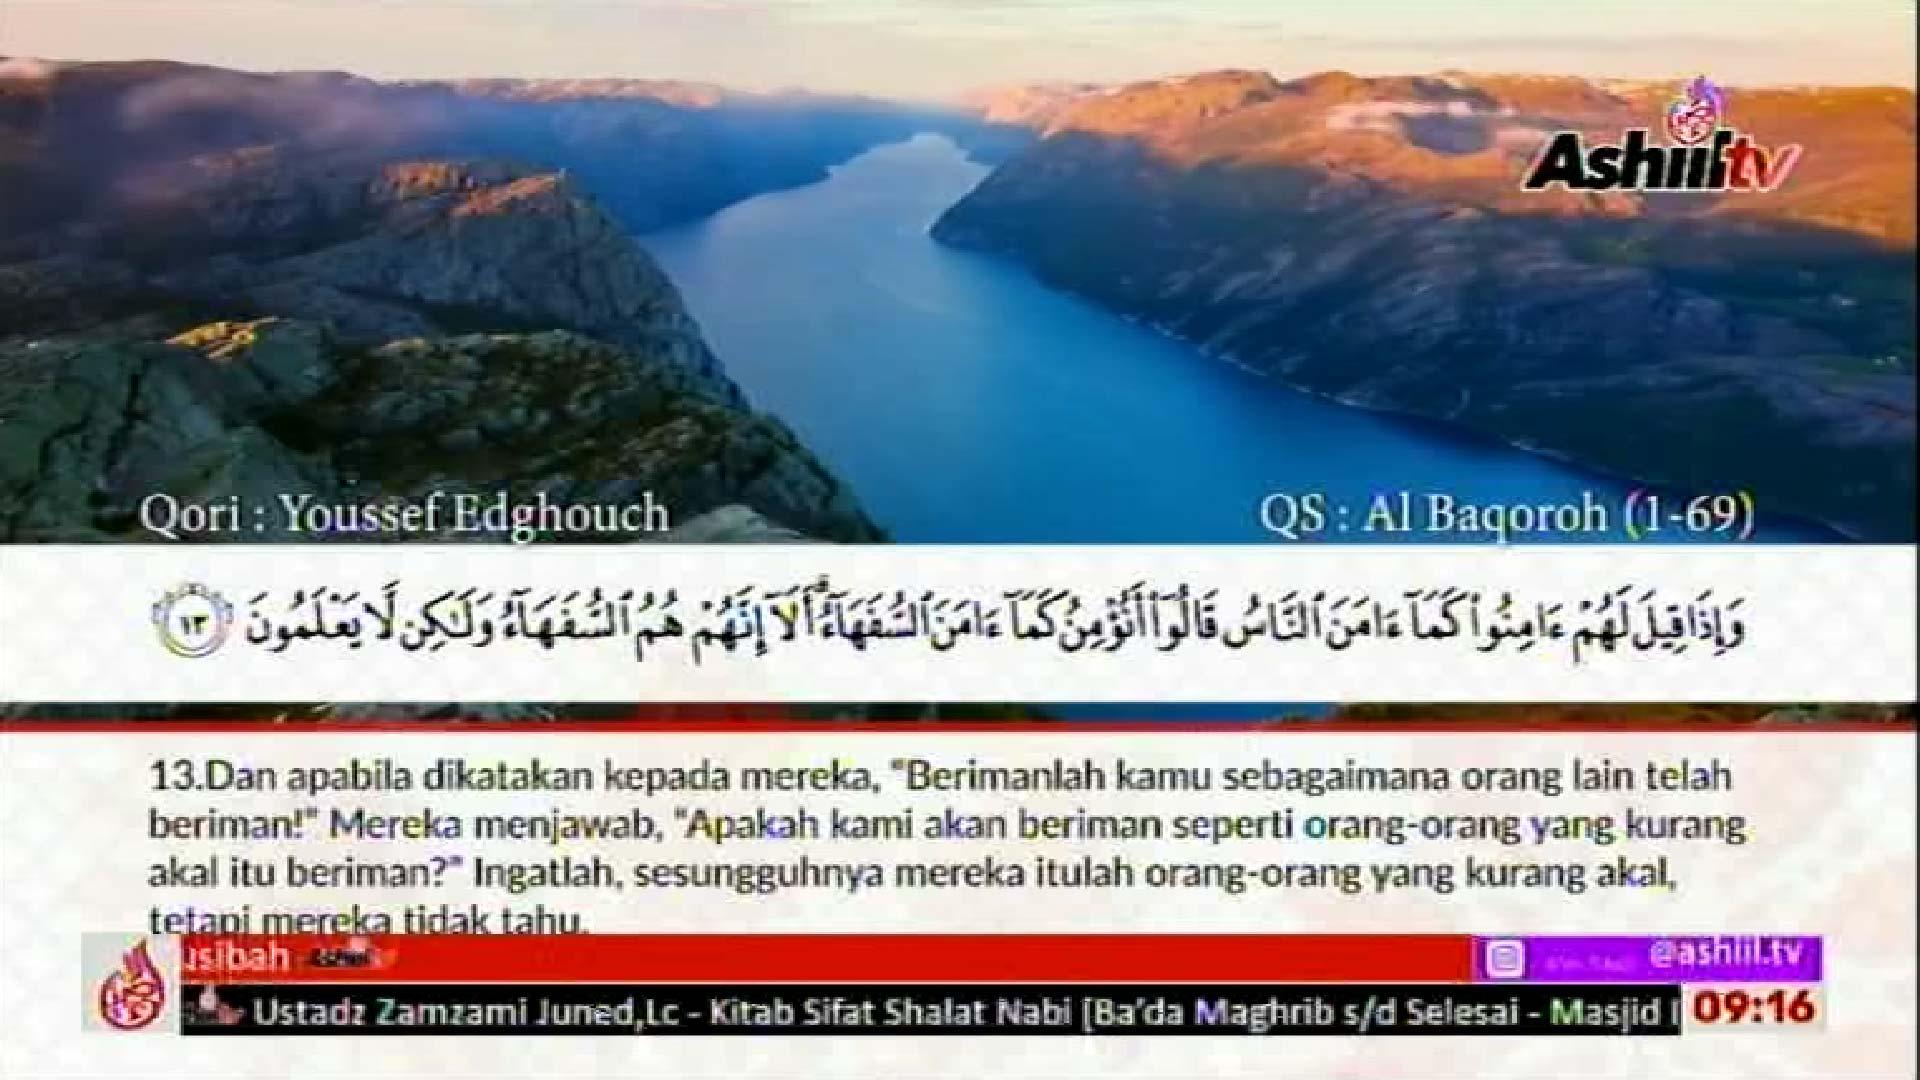 Frekuensi siaran Ashiil TV di satelit Palapa D Terbaru